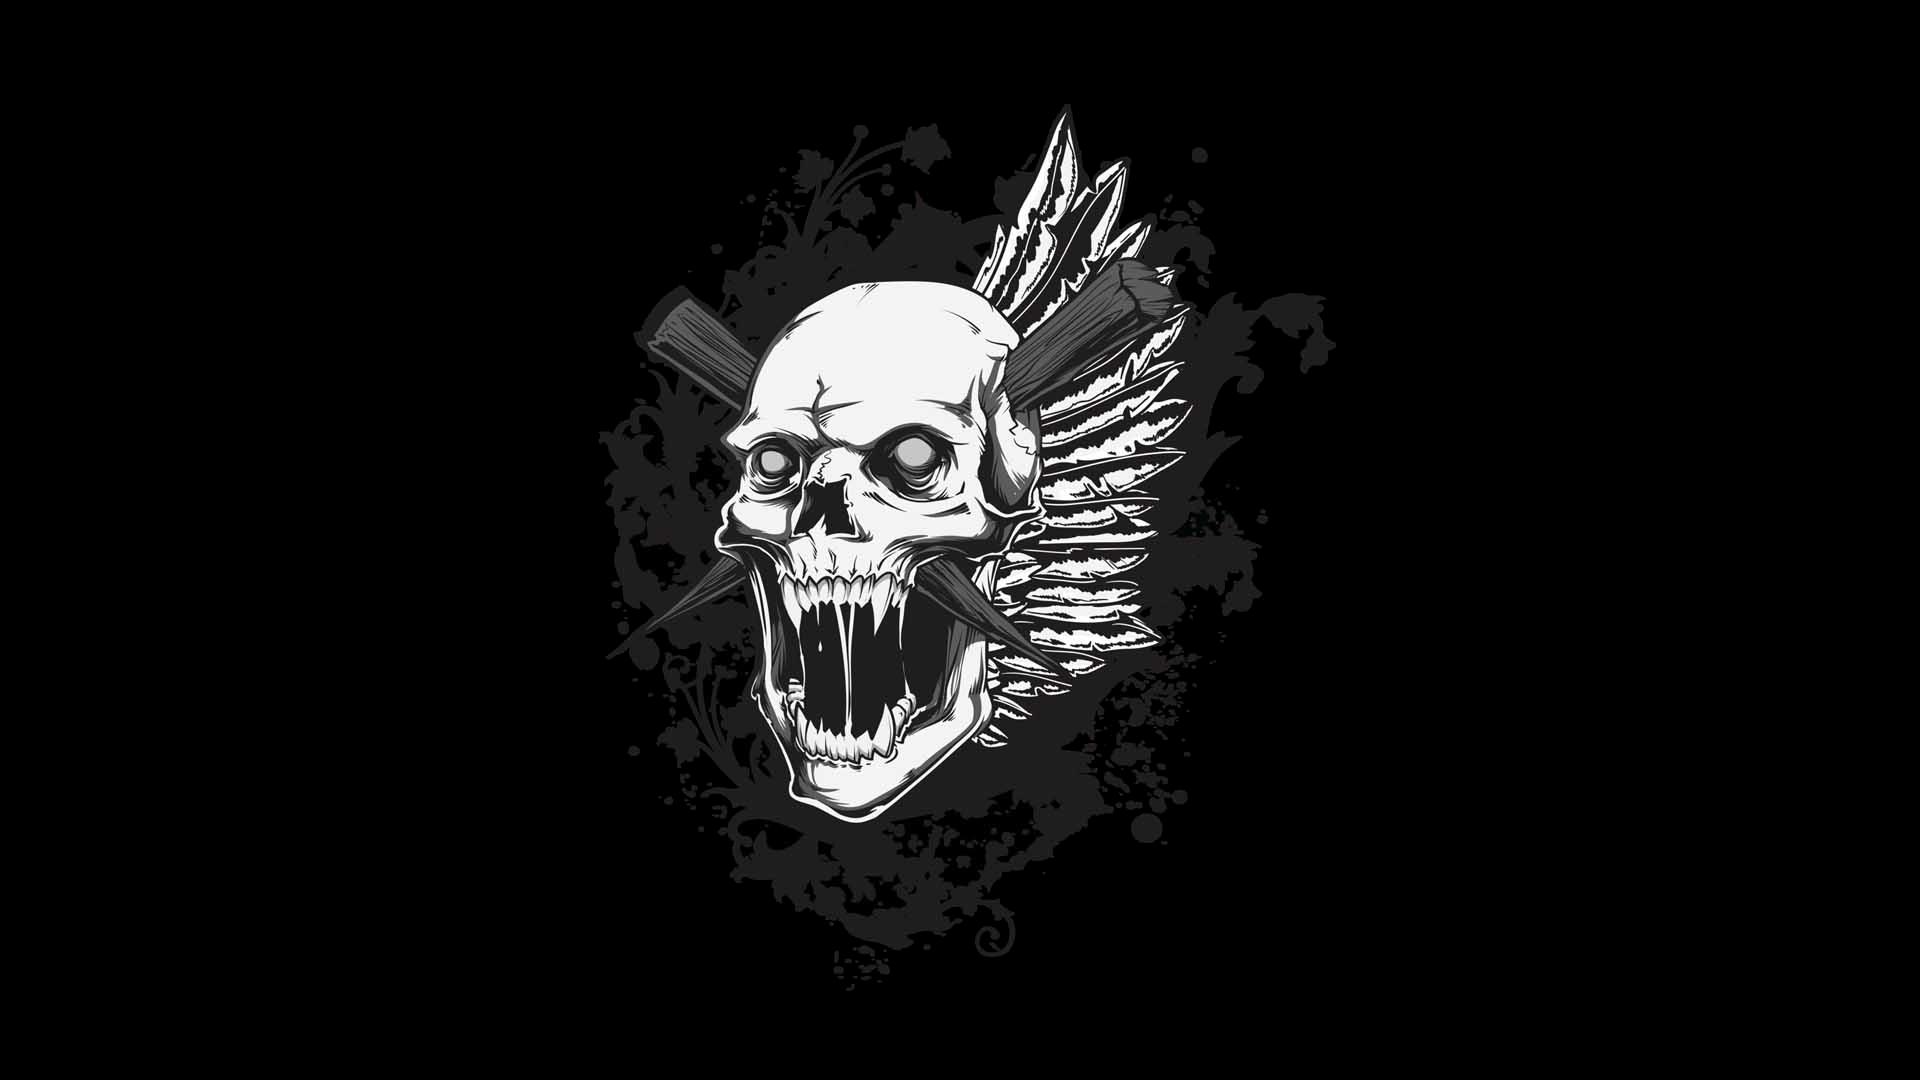 Skull HD Wallpaper   Background Image   1920x1080   ID ...